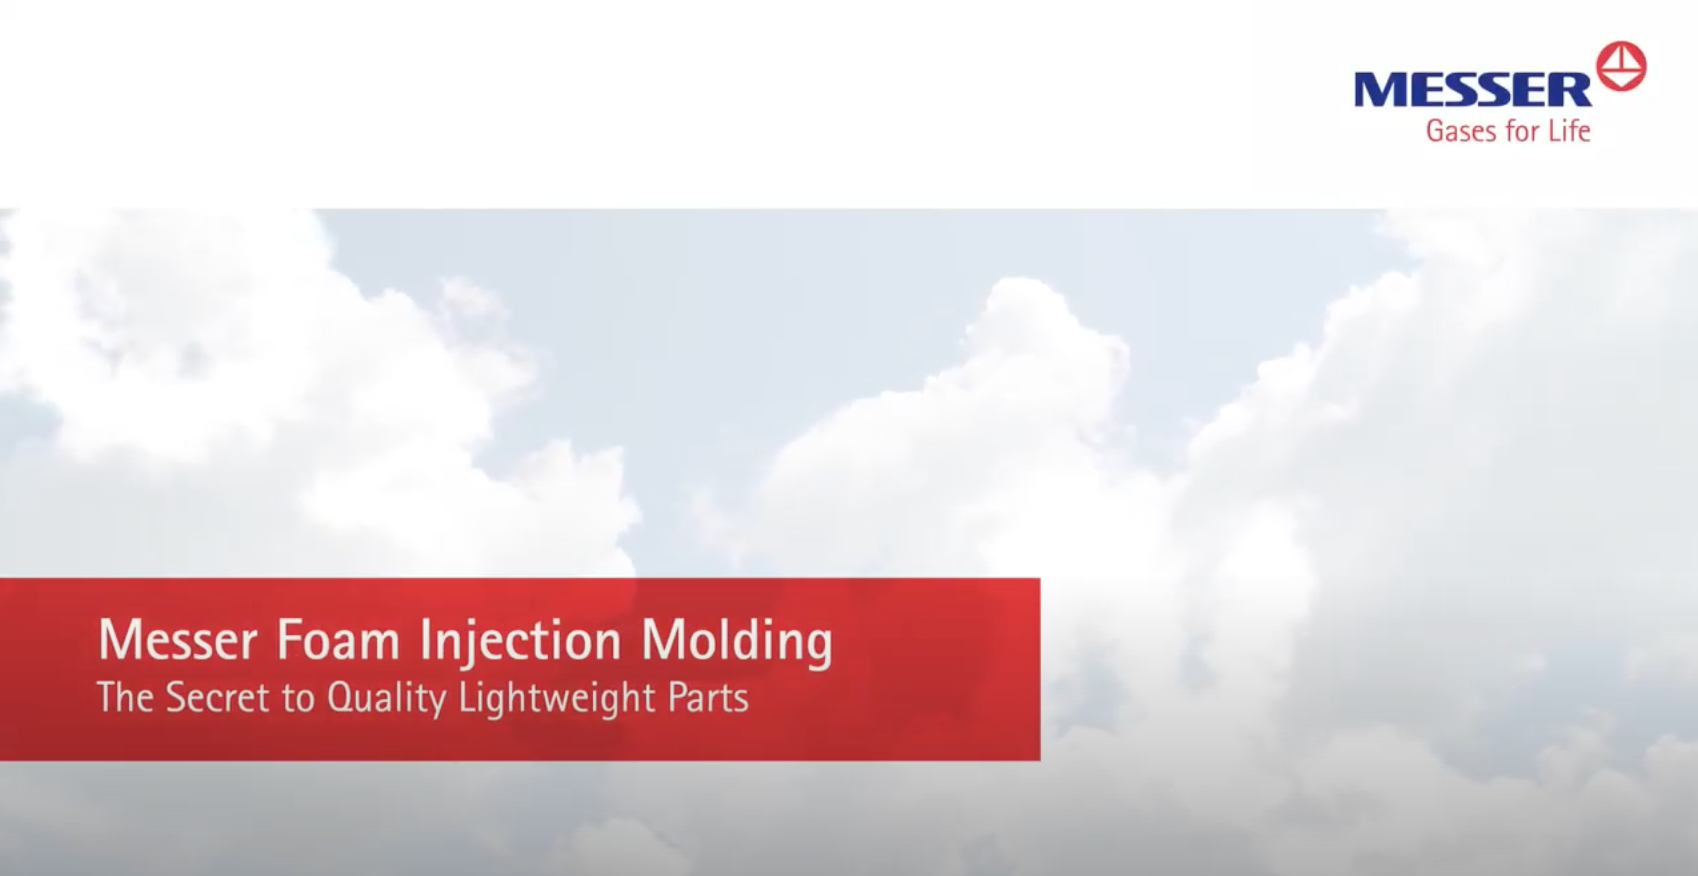 Messer Foam Injection Molding